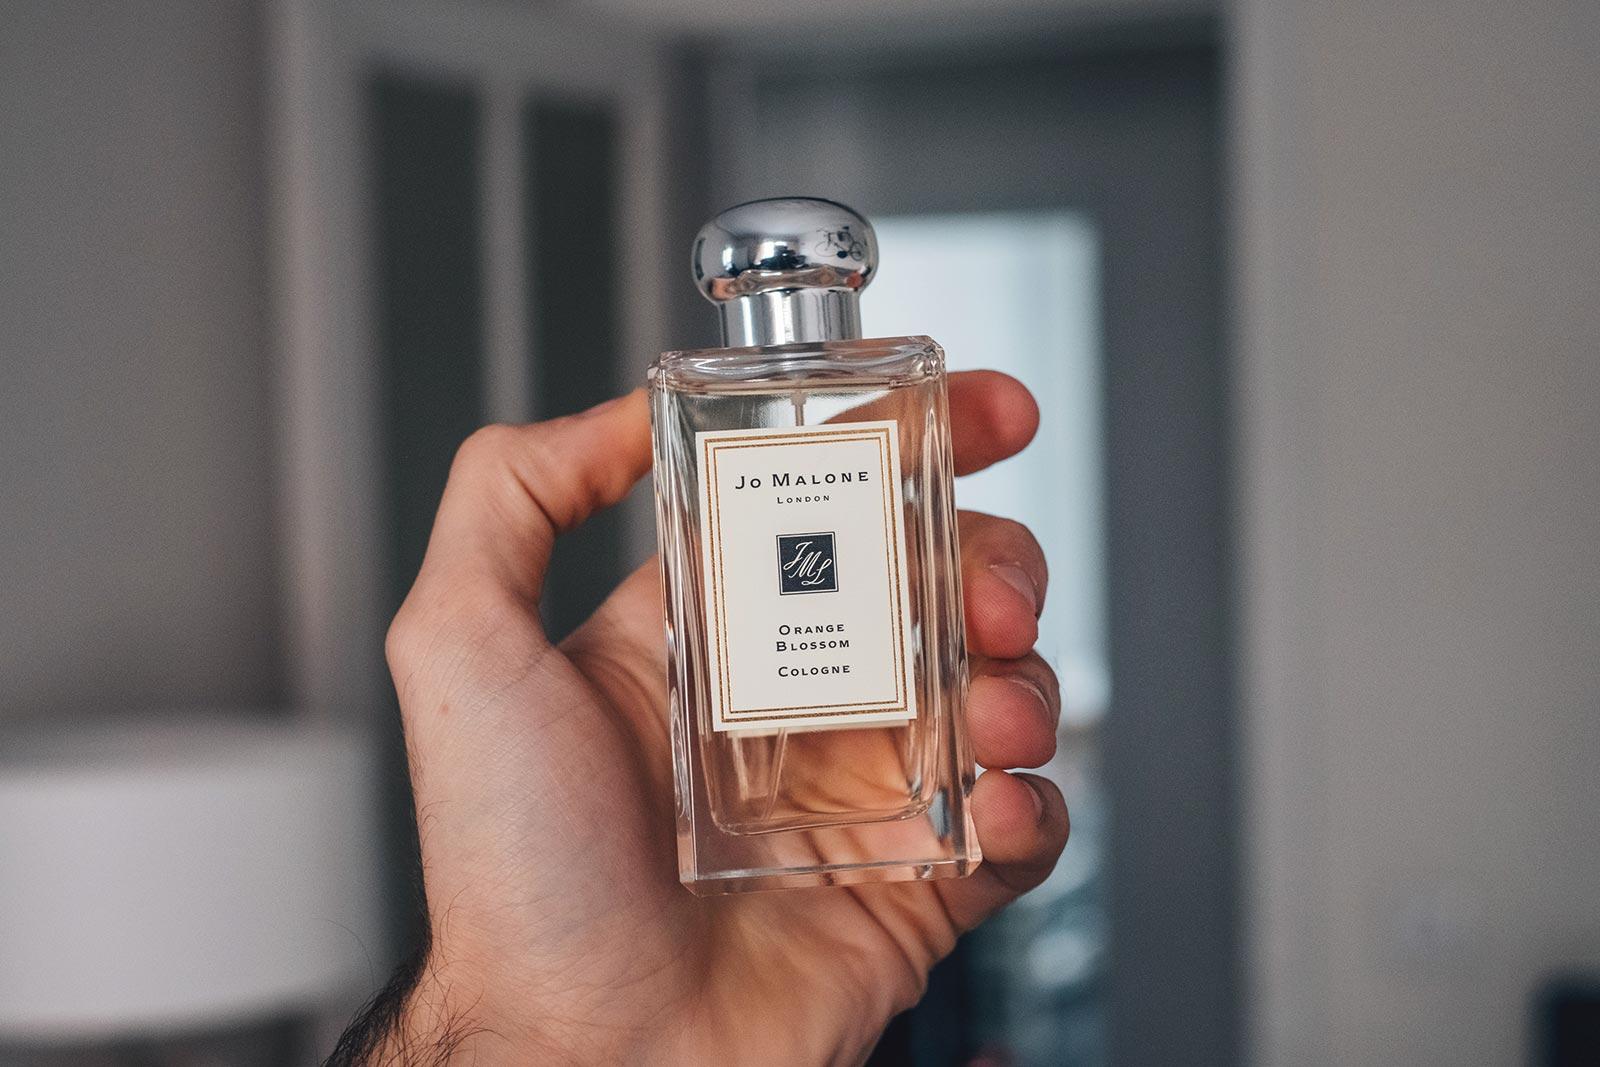 Top parfum saint valentin homme femme Jo Malone